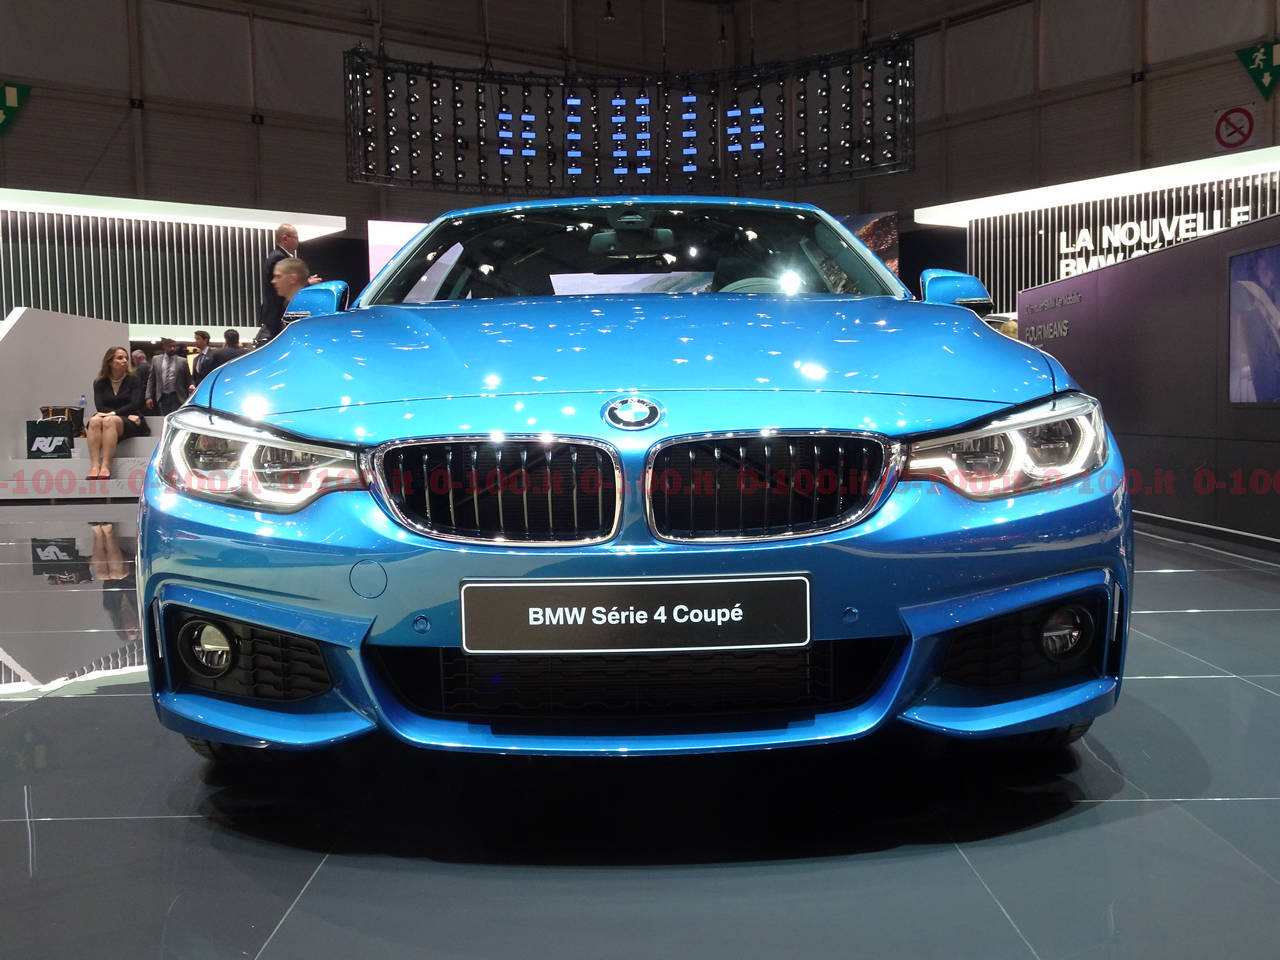 Ginevra-geneva-geneve-2017-BMW_Serie-4_0-100_5